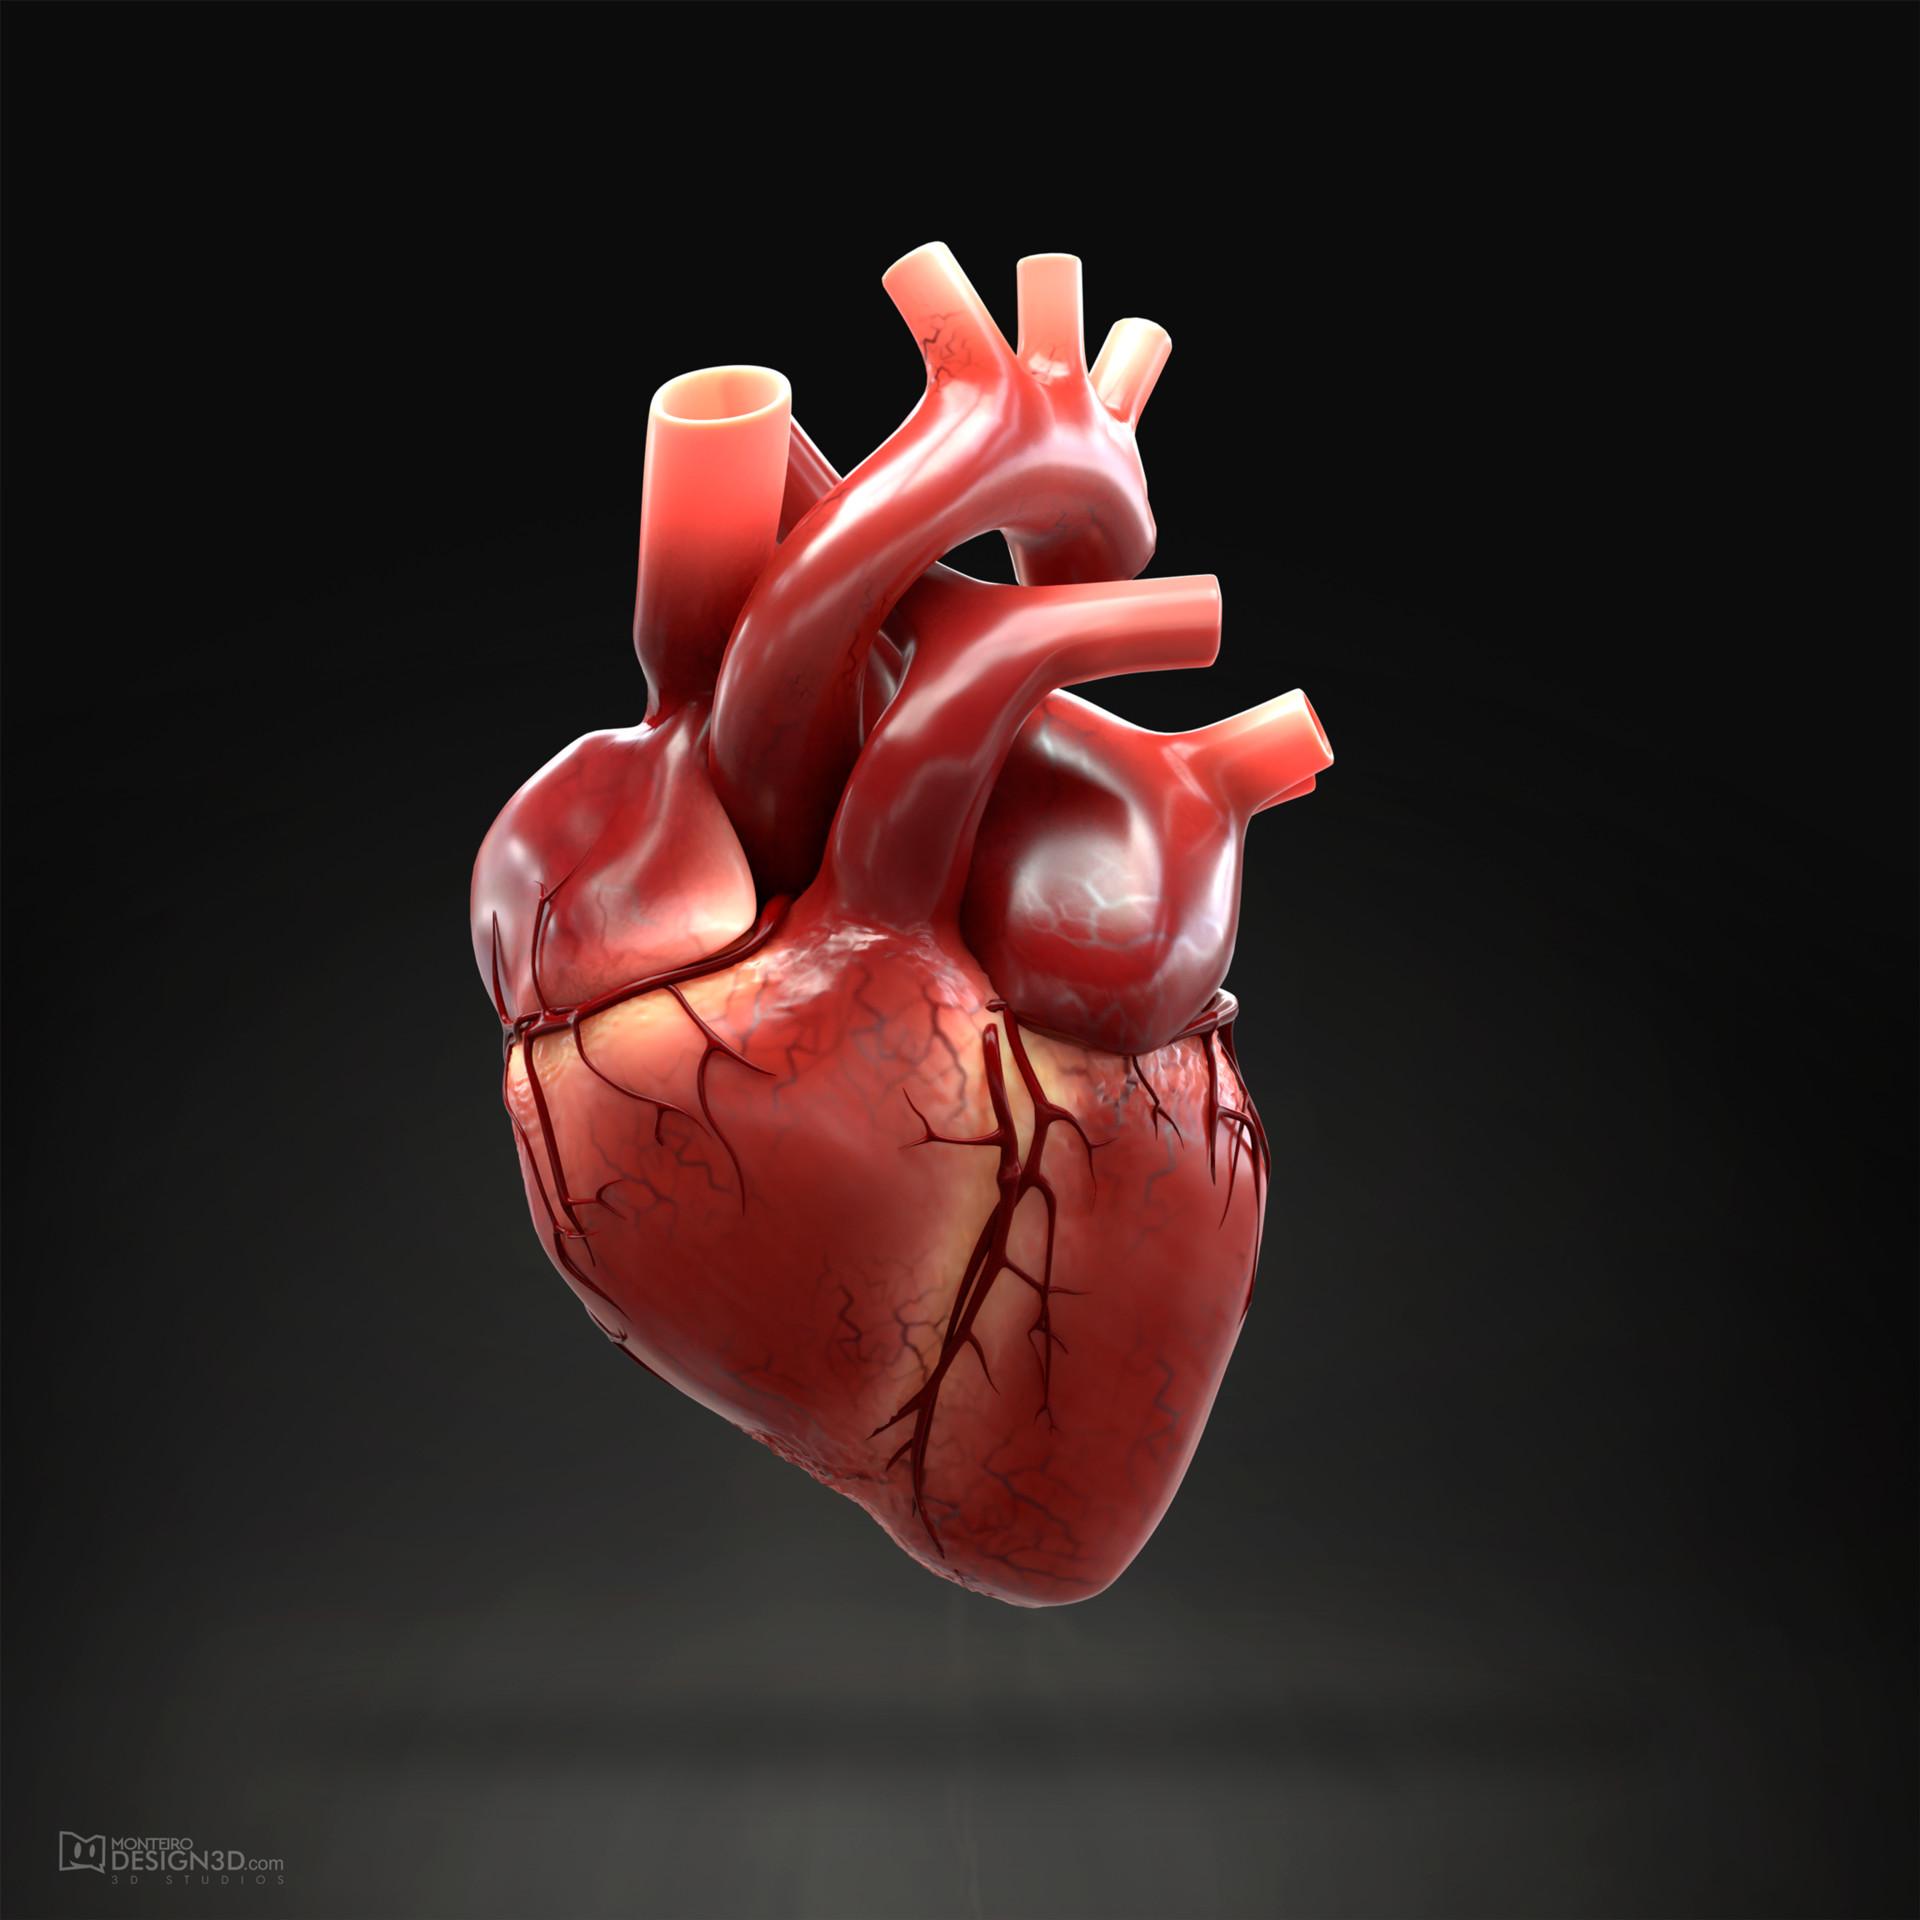 Alisson monteiro heart 3d